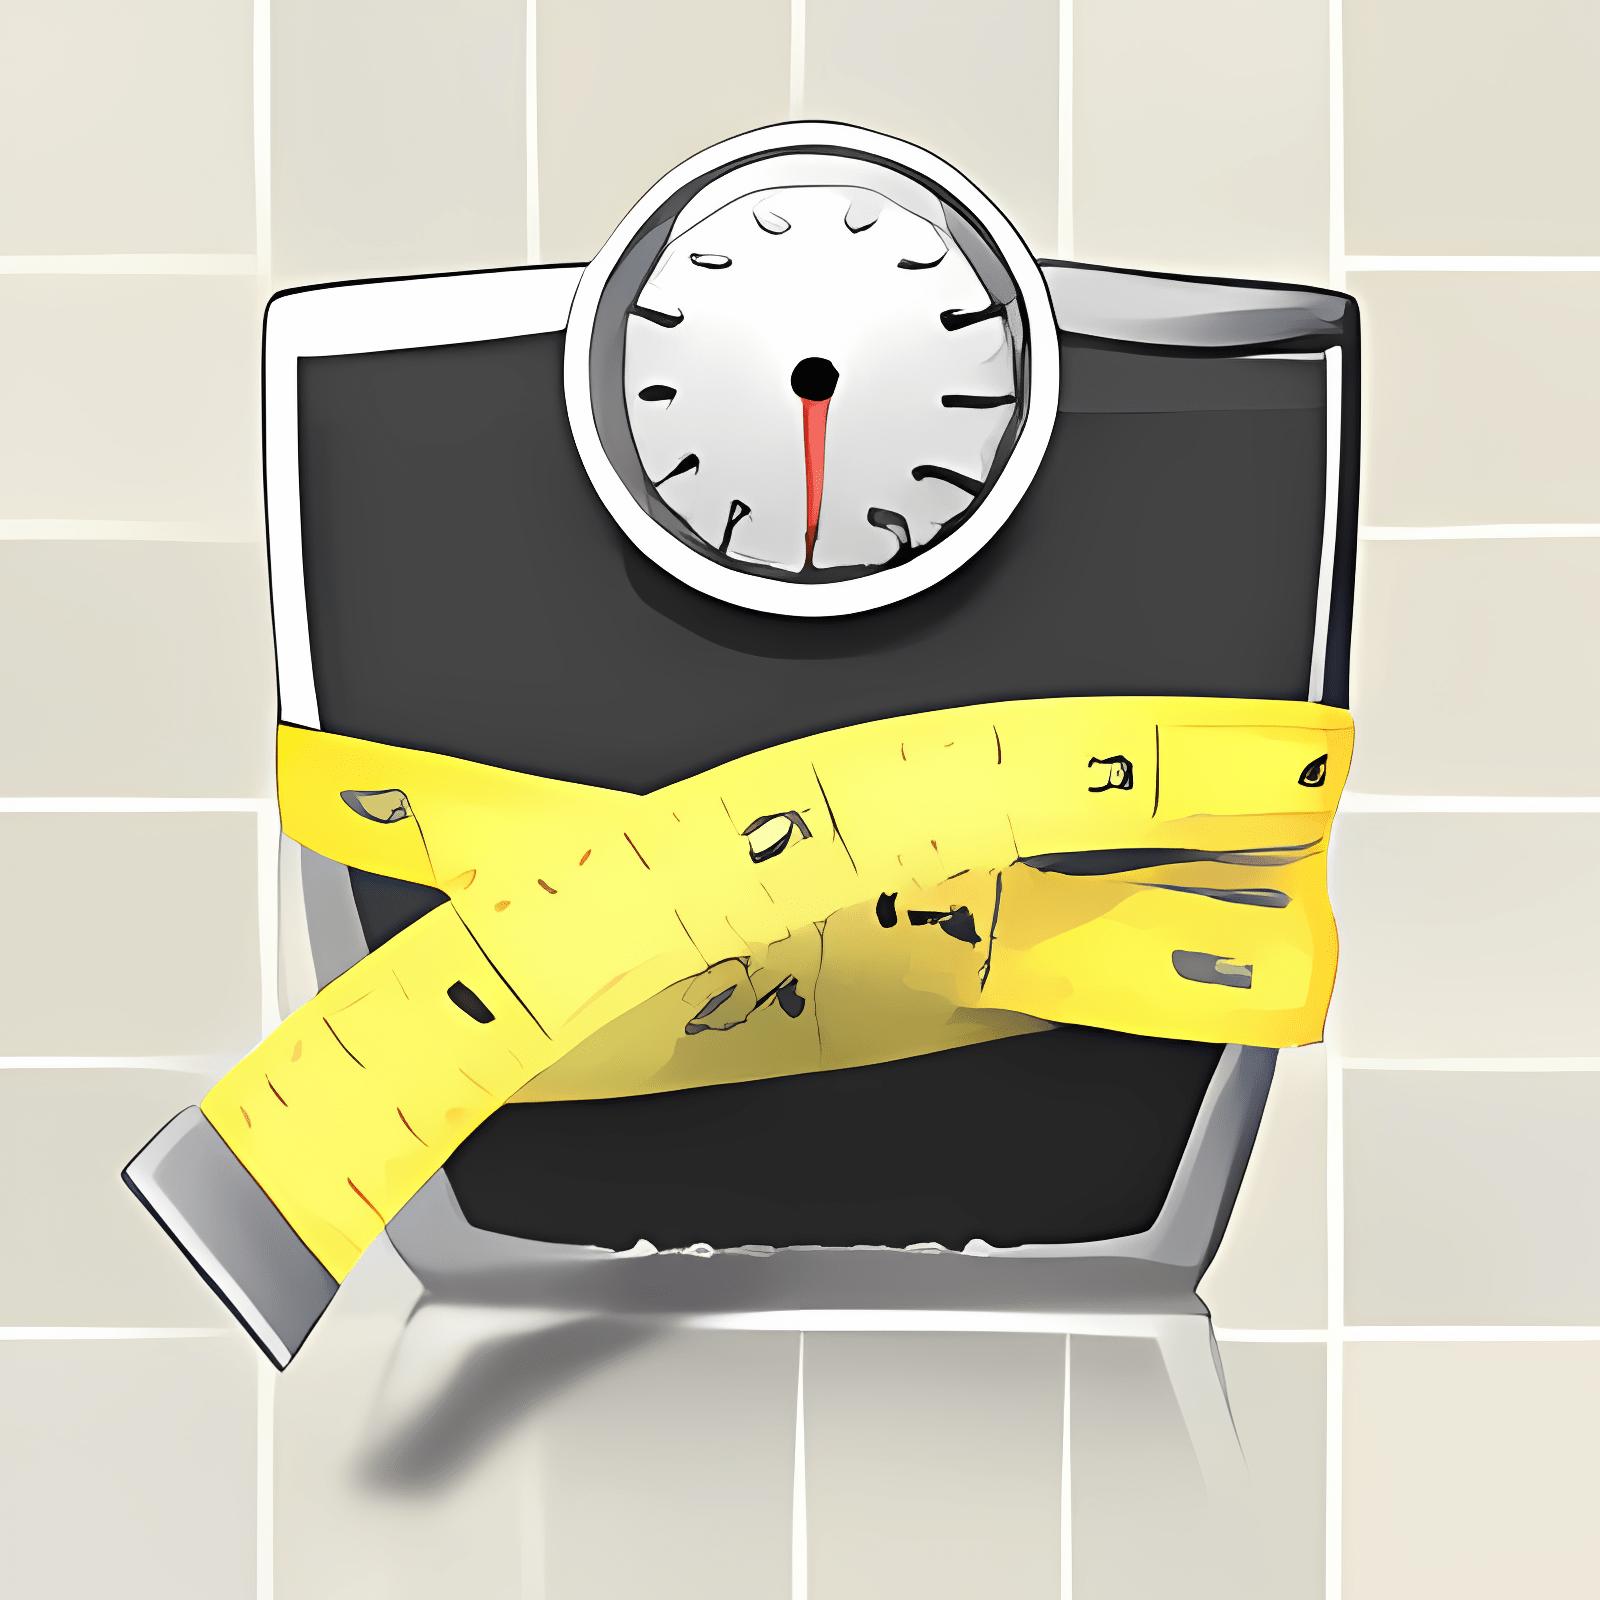 Dieta Siete dias